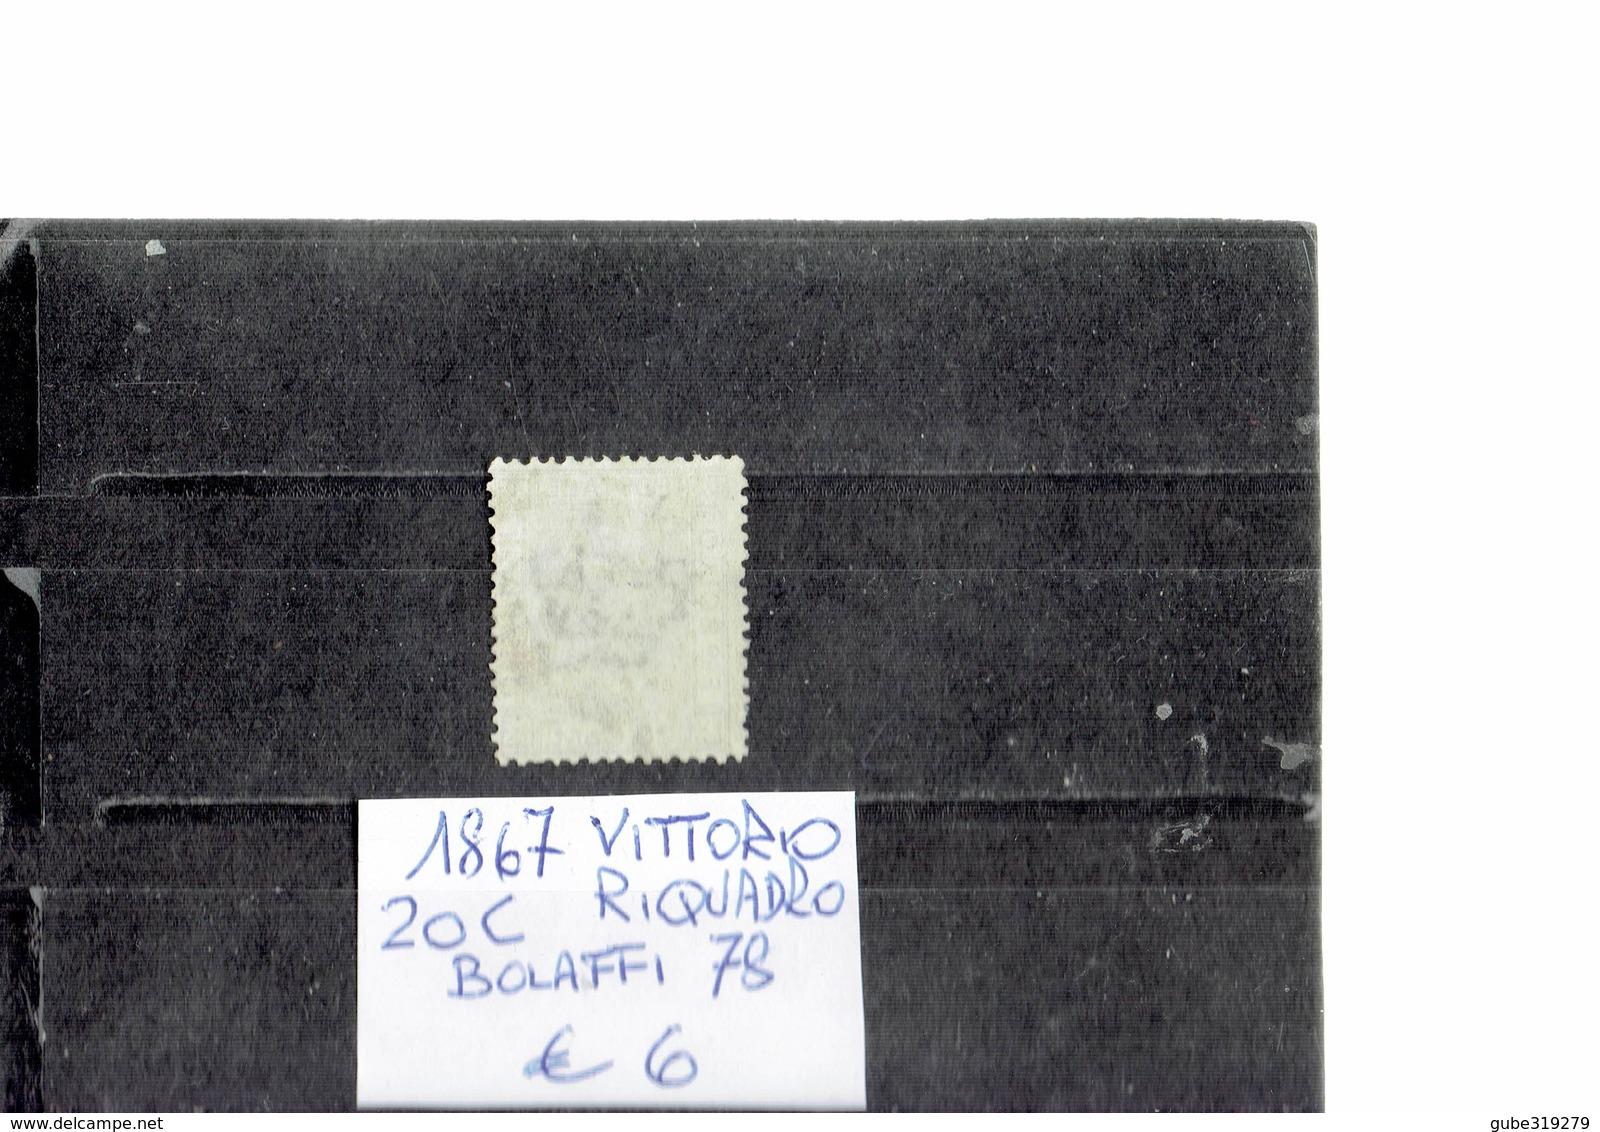 ITALY 1867 - VITTORIO RIQUADRO AZZURRO  20 CENTESIMI   USATO (Bolaffi 78) ALBVEC ITA 20AZR - 1861-78 Vittorio Emanuele II